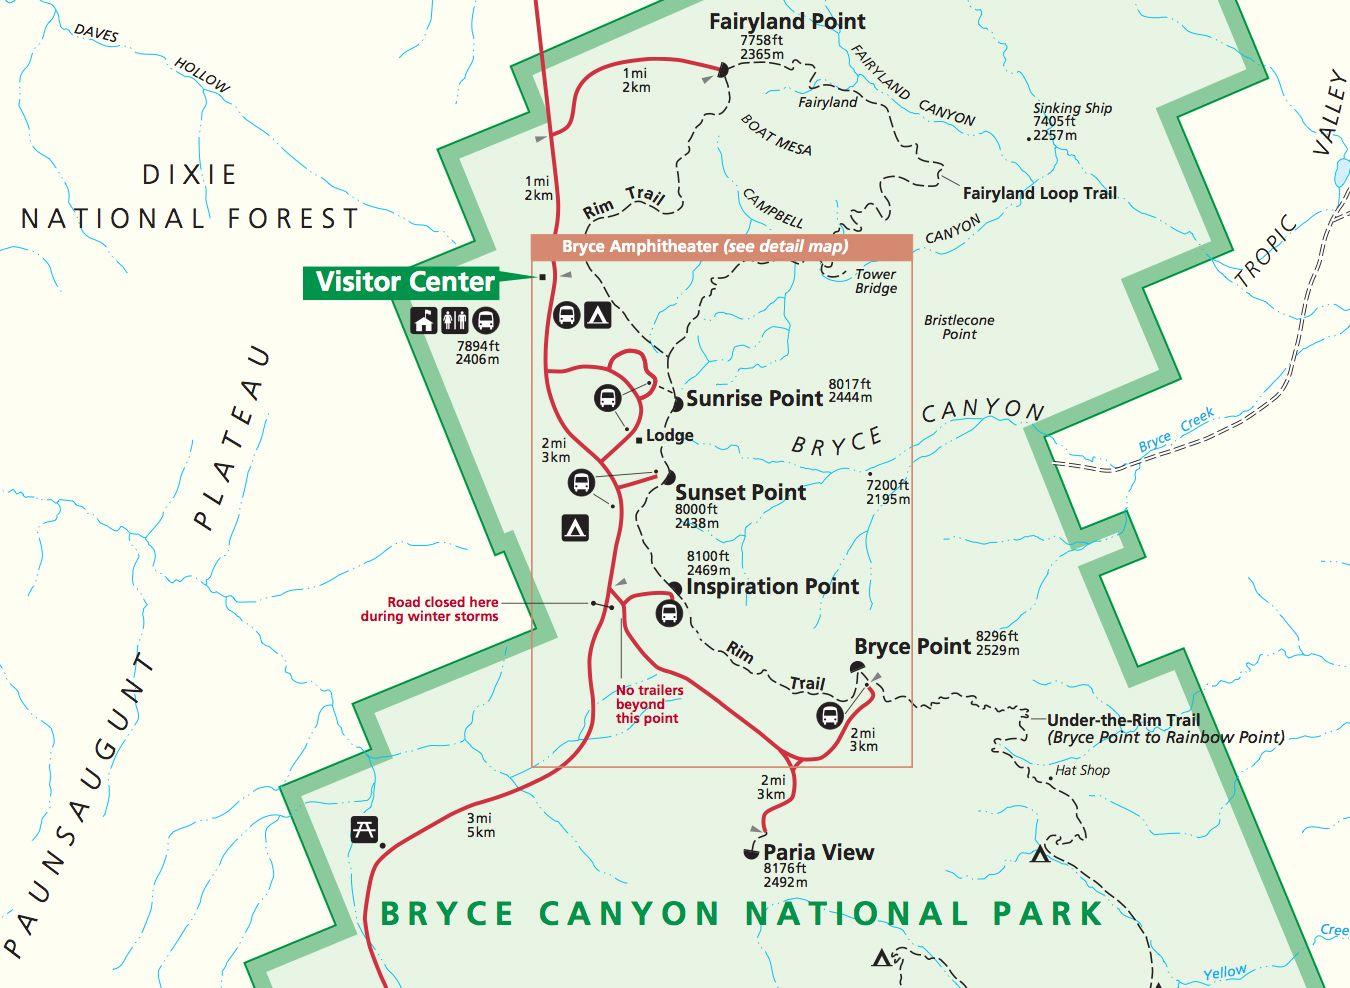 bryce canyon hiking map Google Search Travel Pinterest Bryce